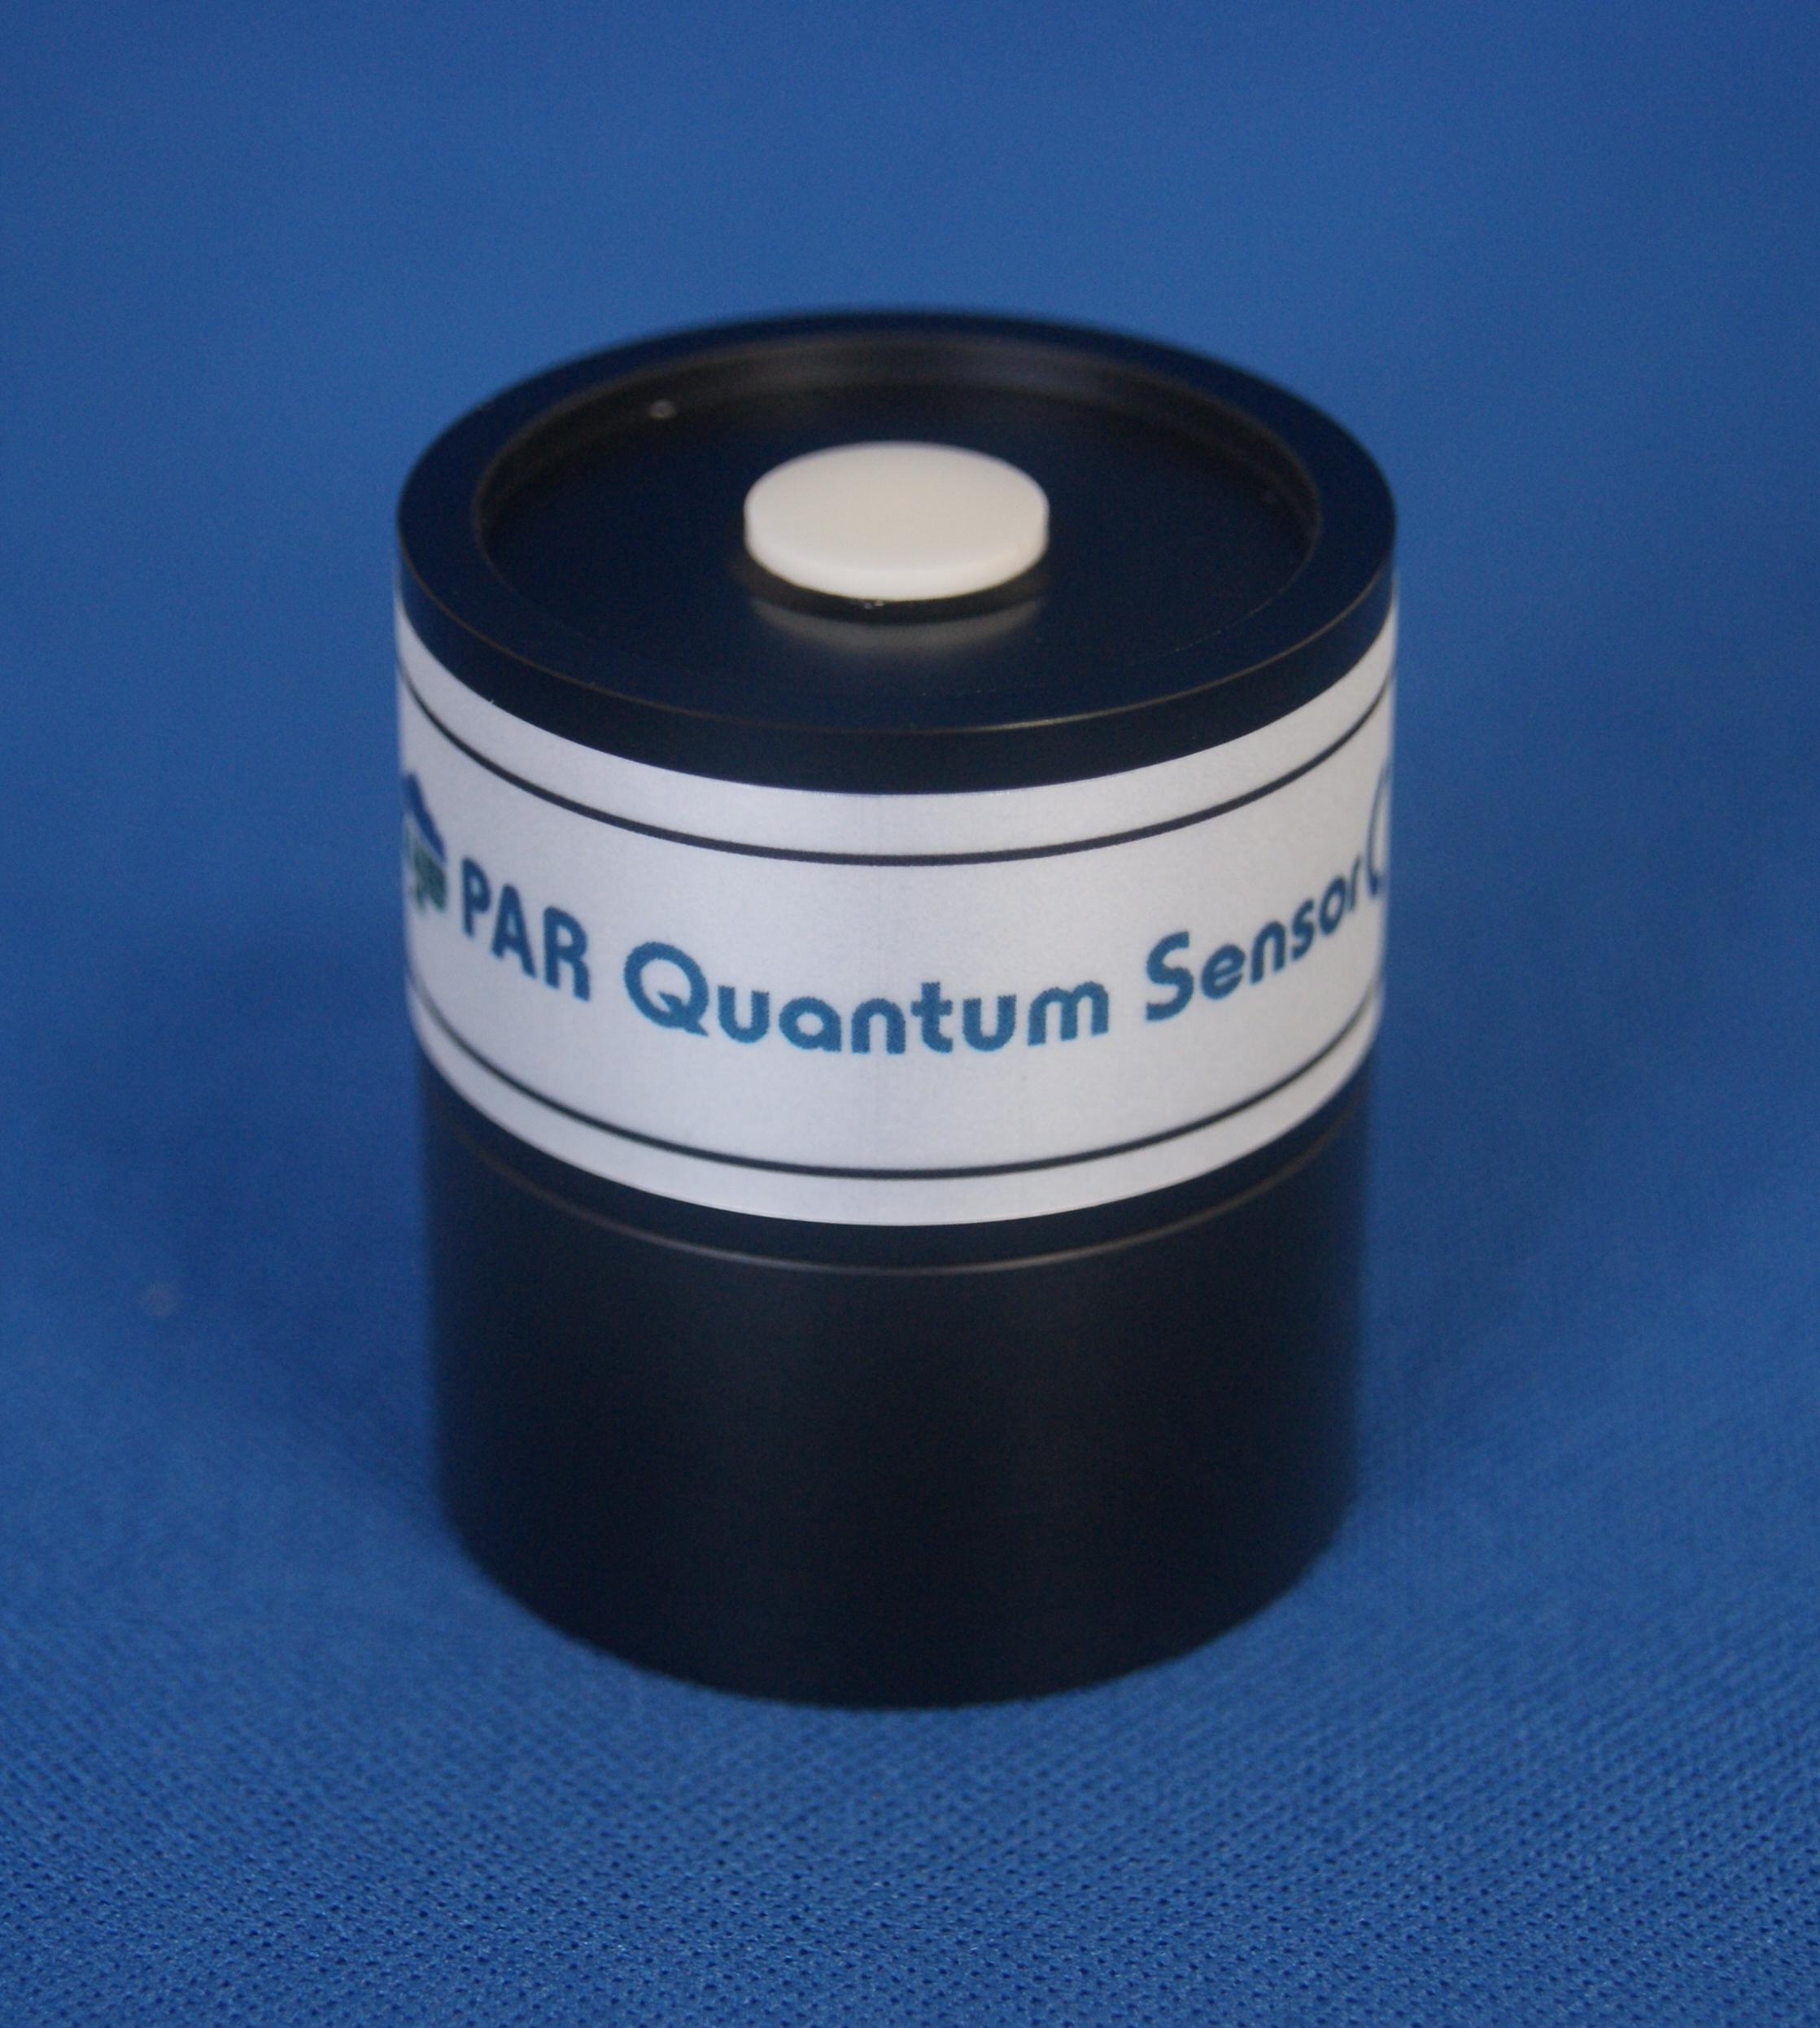 PAR Sensor from Skye Instruments